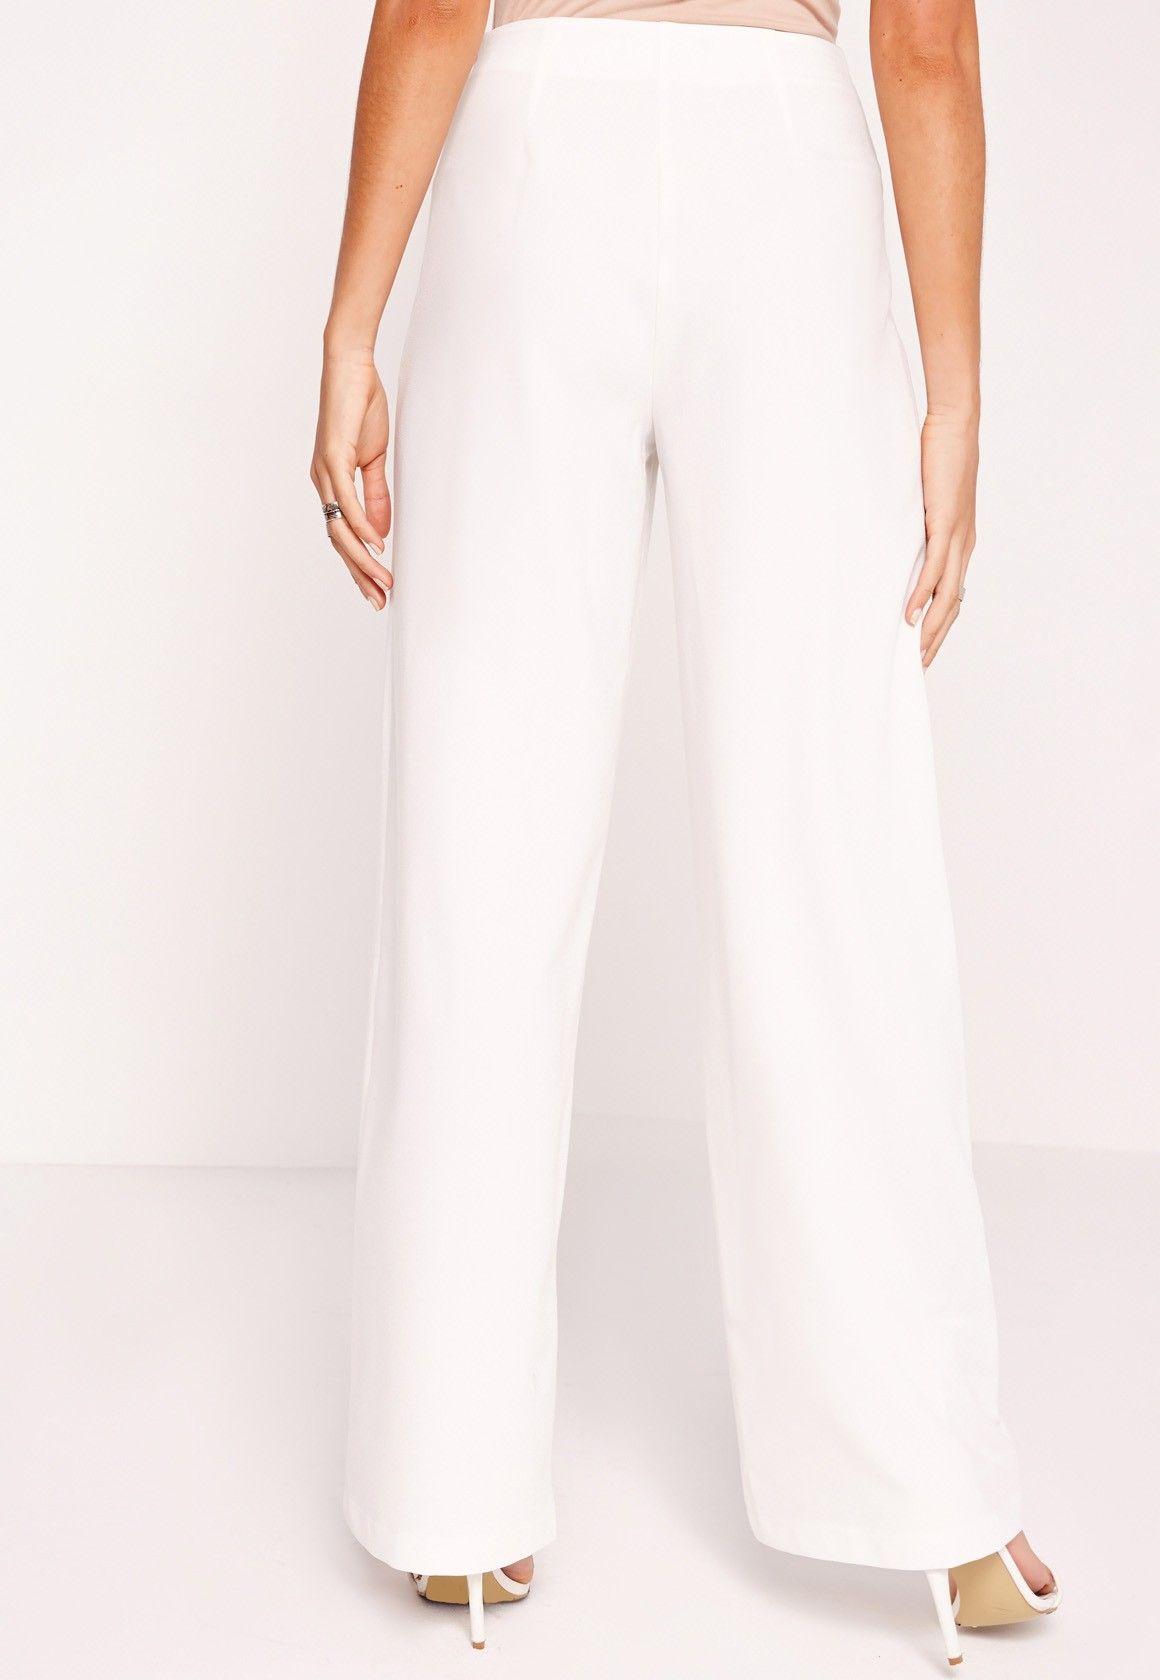 359f8e1d Tie Belt Super Wide Leg Trousers White | 时装2 | Wide leg trousers ...